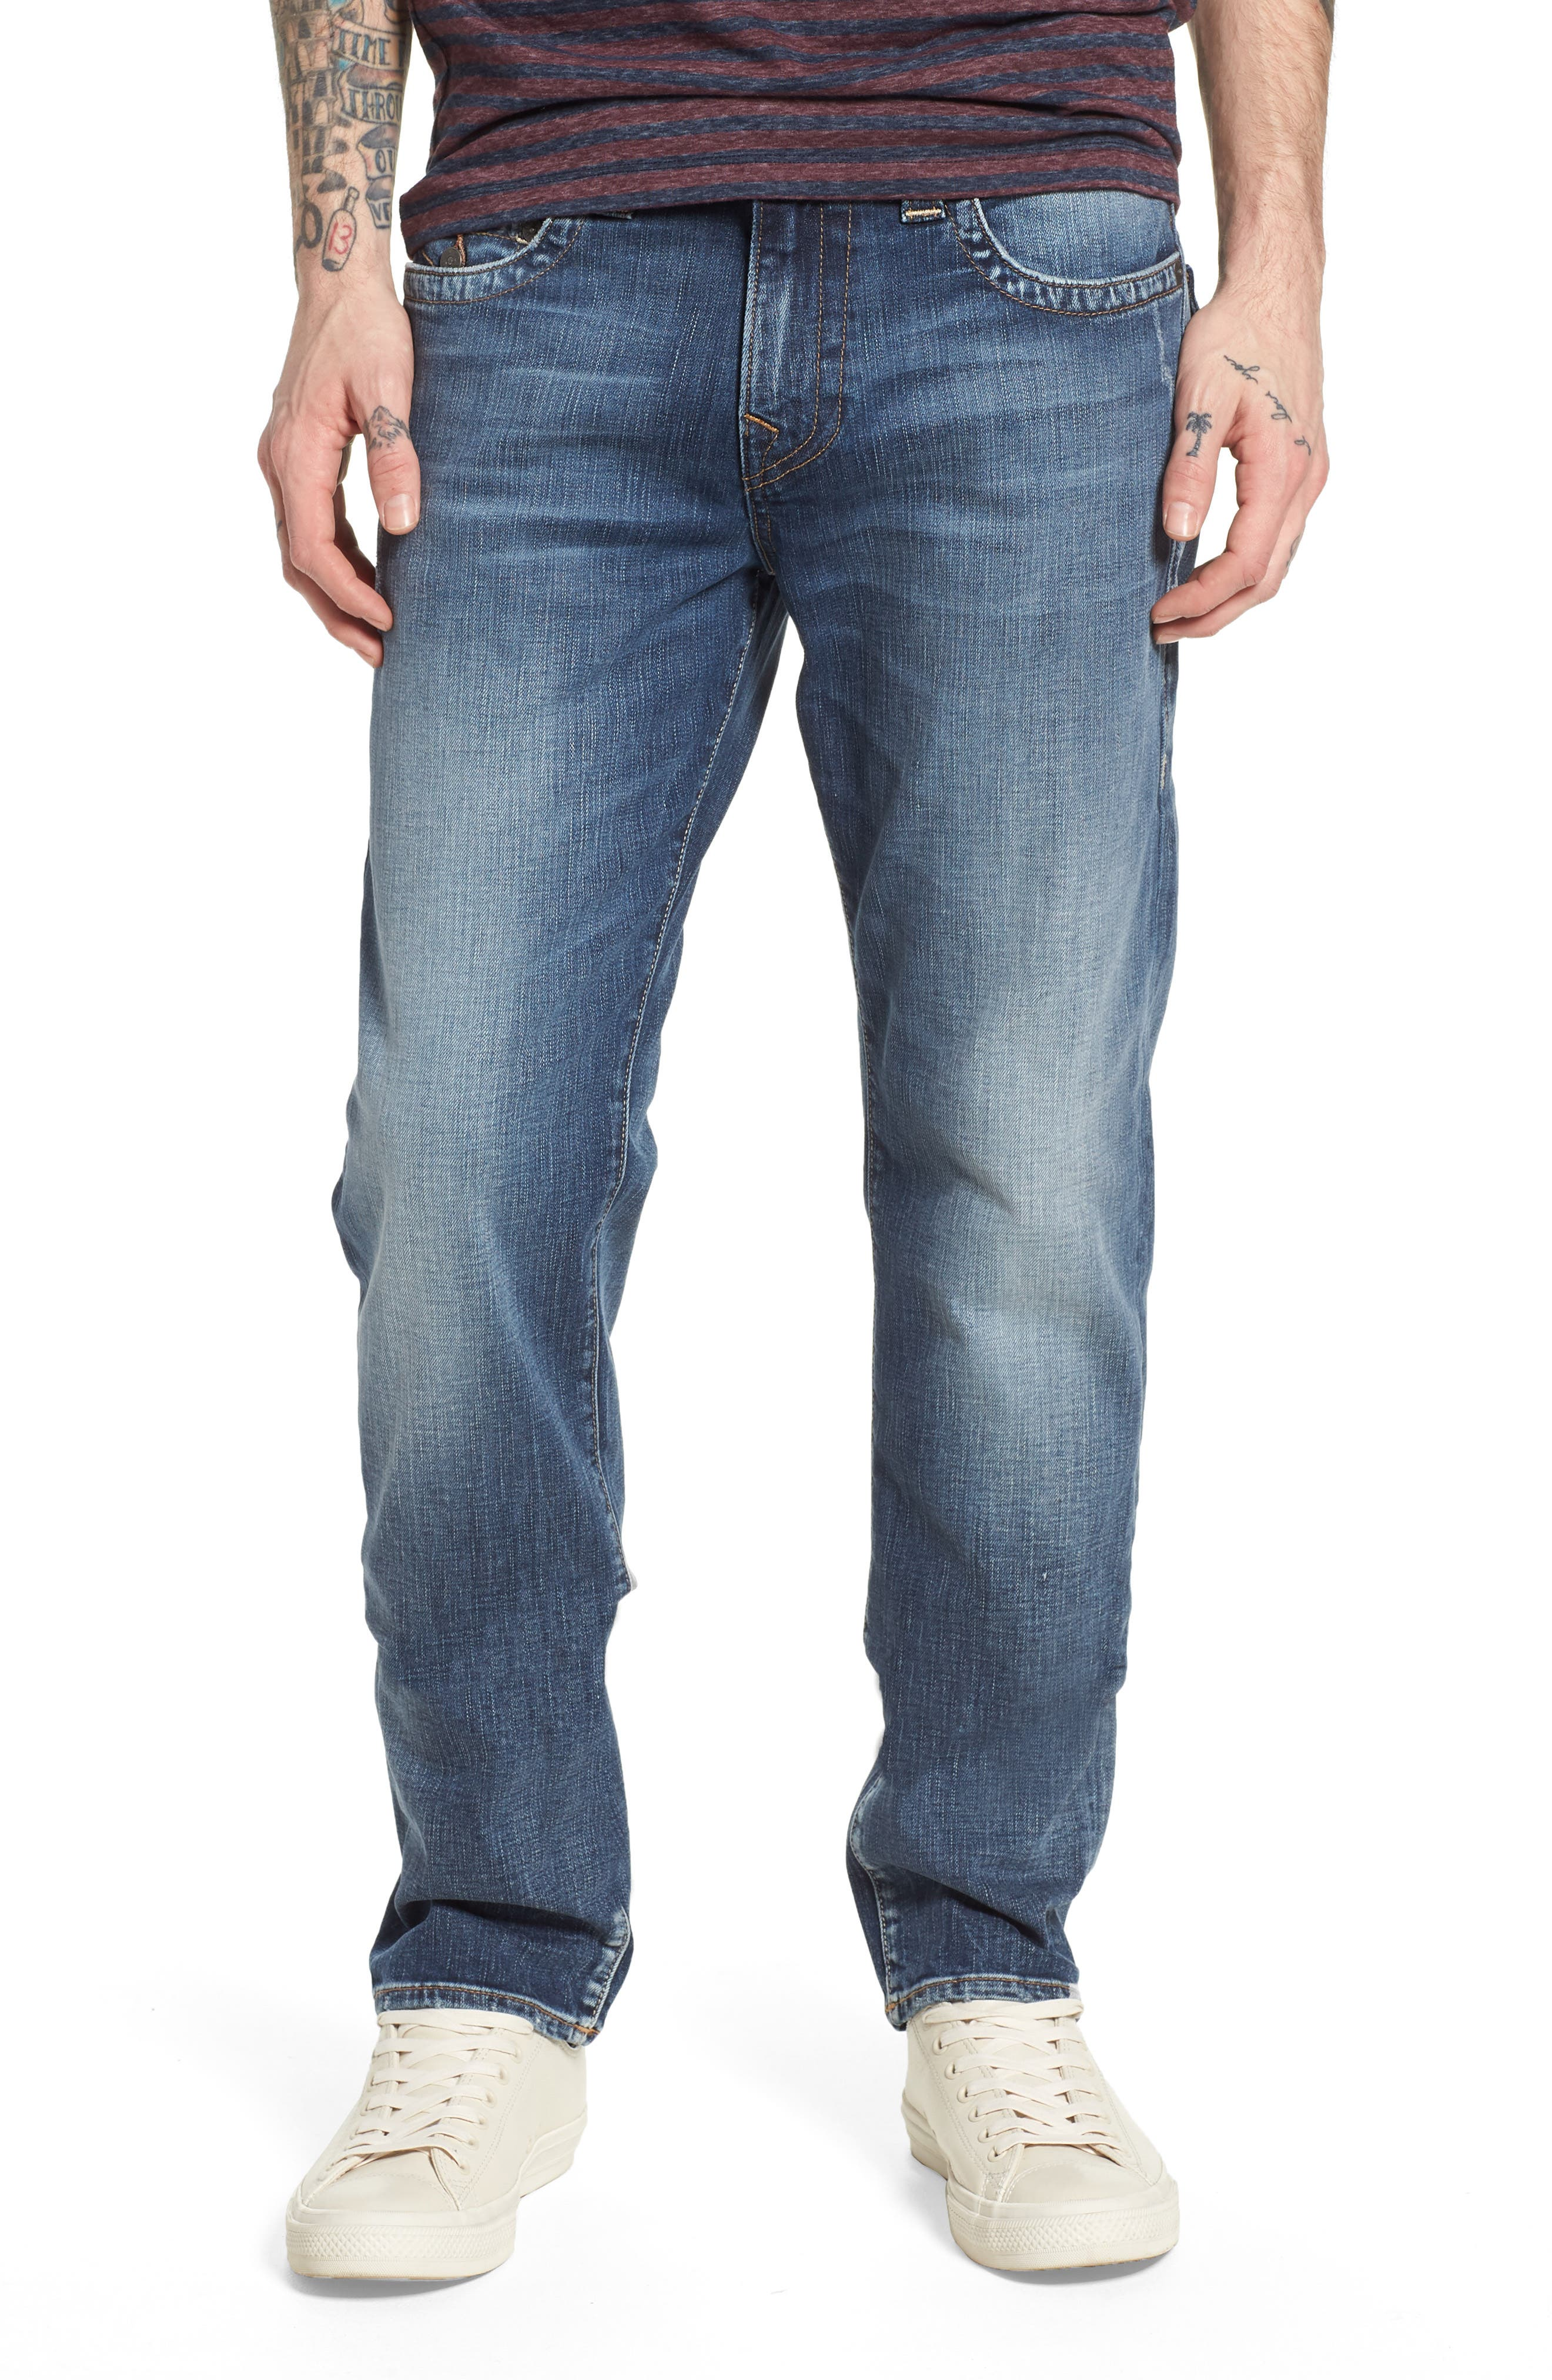 Geno Straight Leg Jeans,                             Main thumbnail 1, color,                             Morning Haze